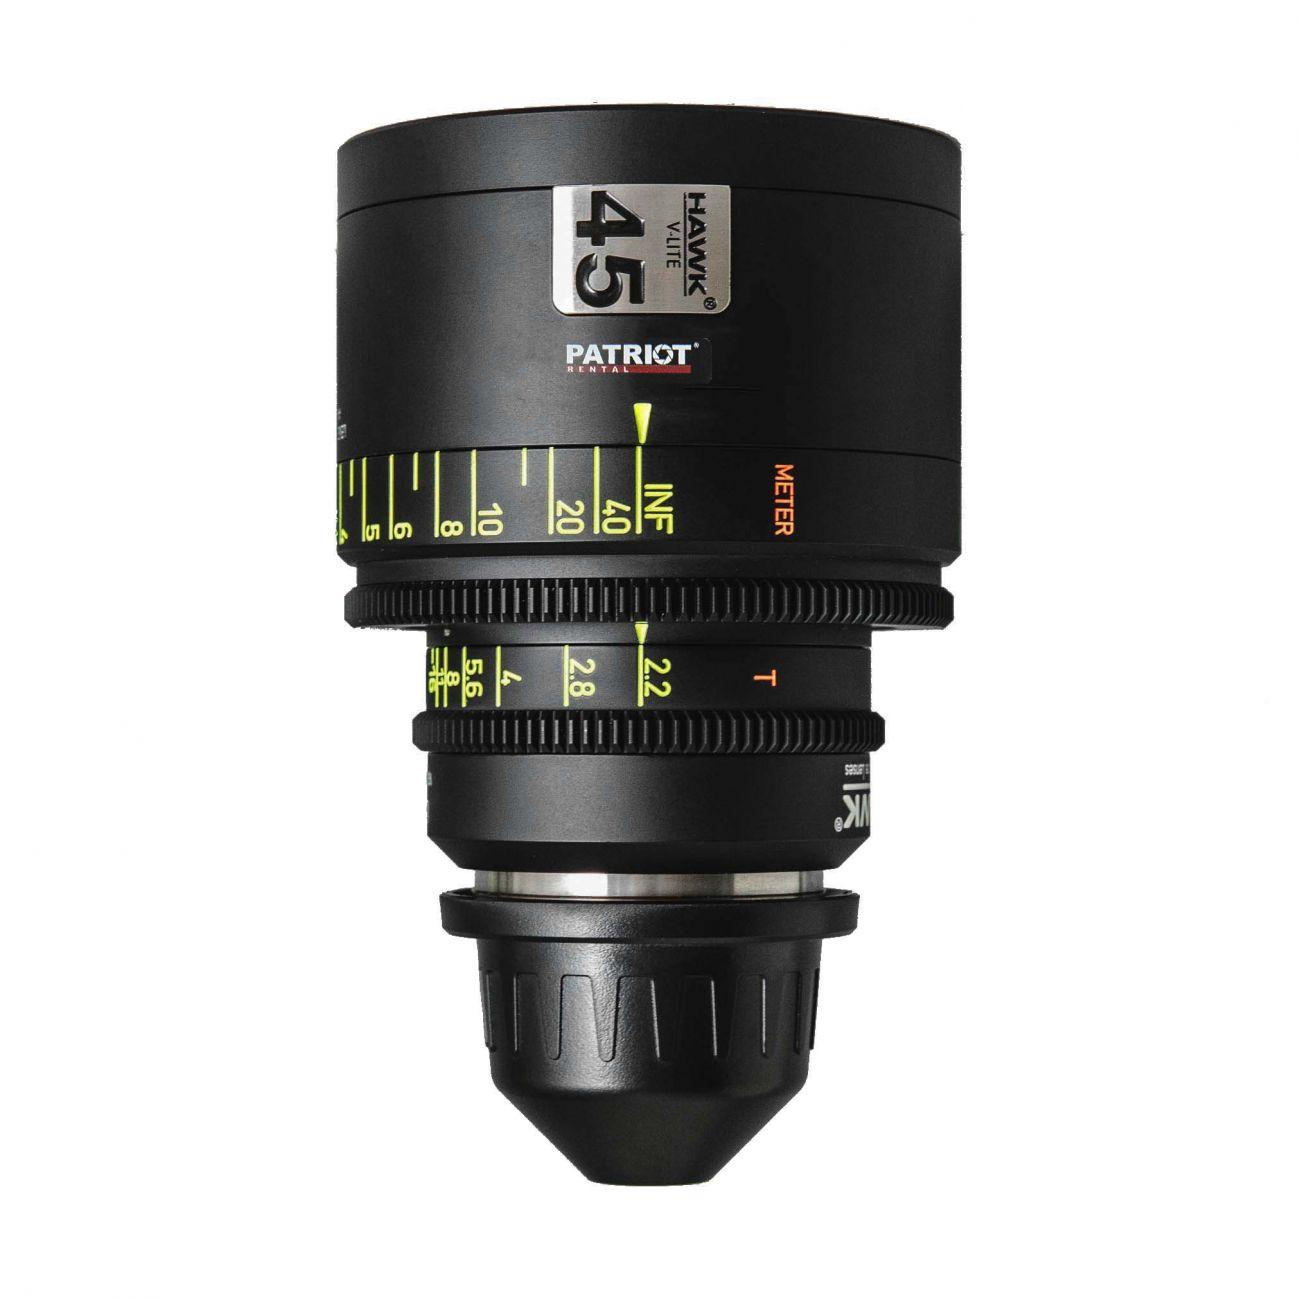 45mm HAWK V-LITE ANAMORPHIC Lens T2.2